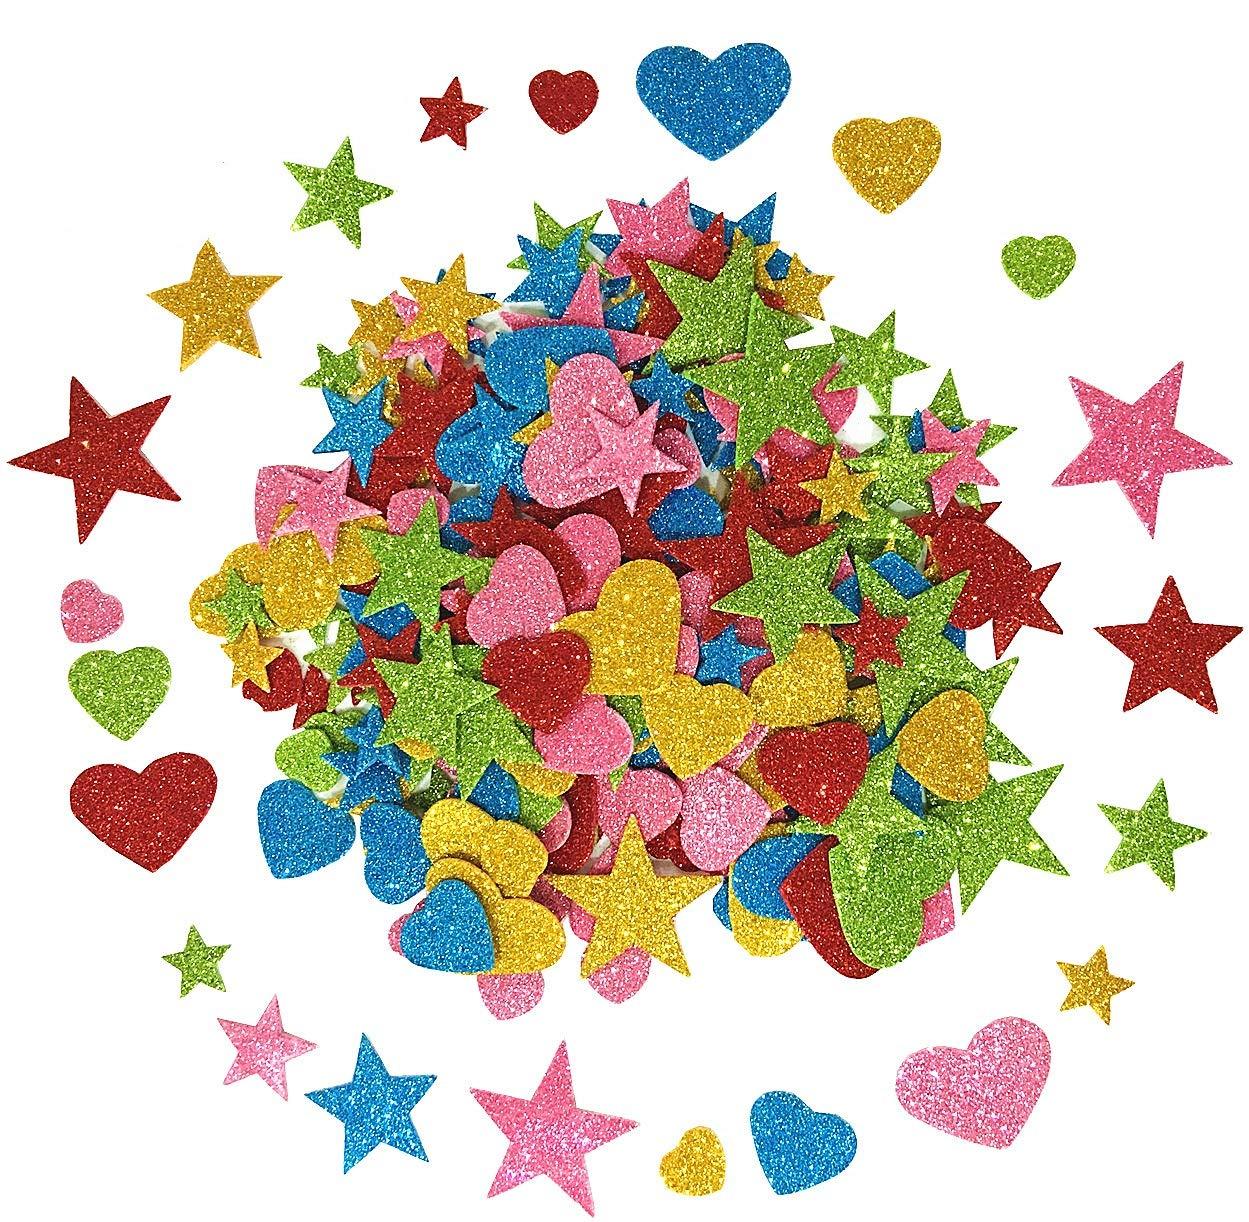 Foam Glitter Stickers Self Adhesive, Mini Heart and